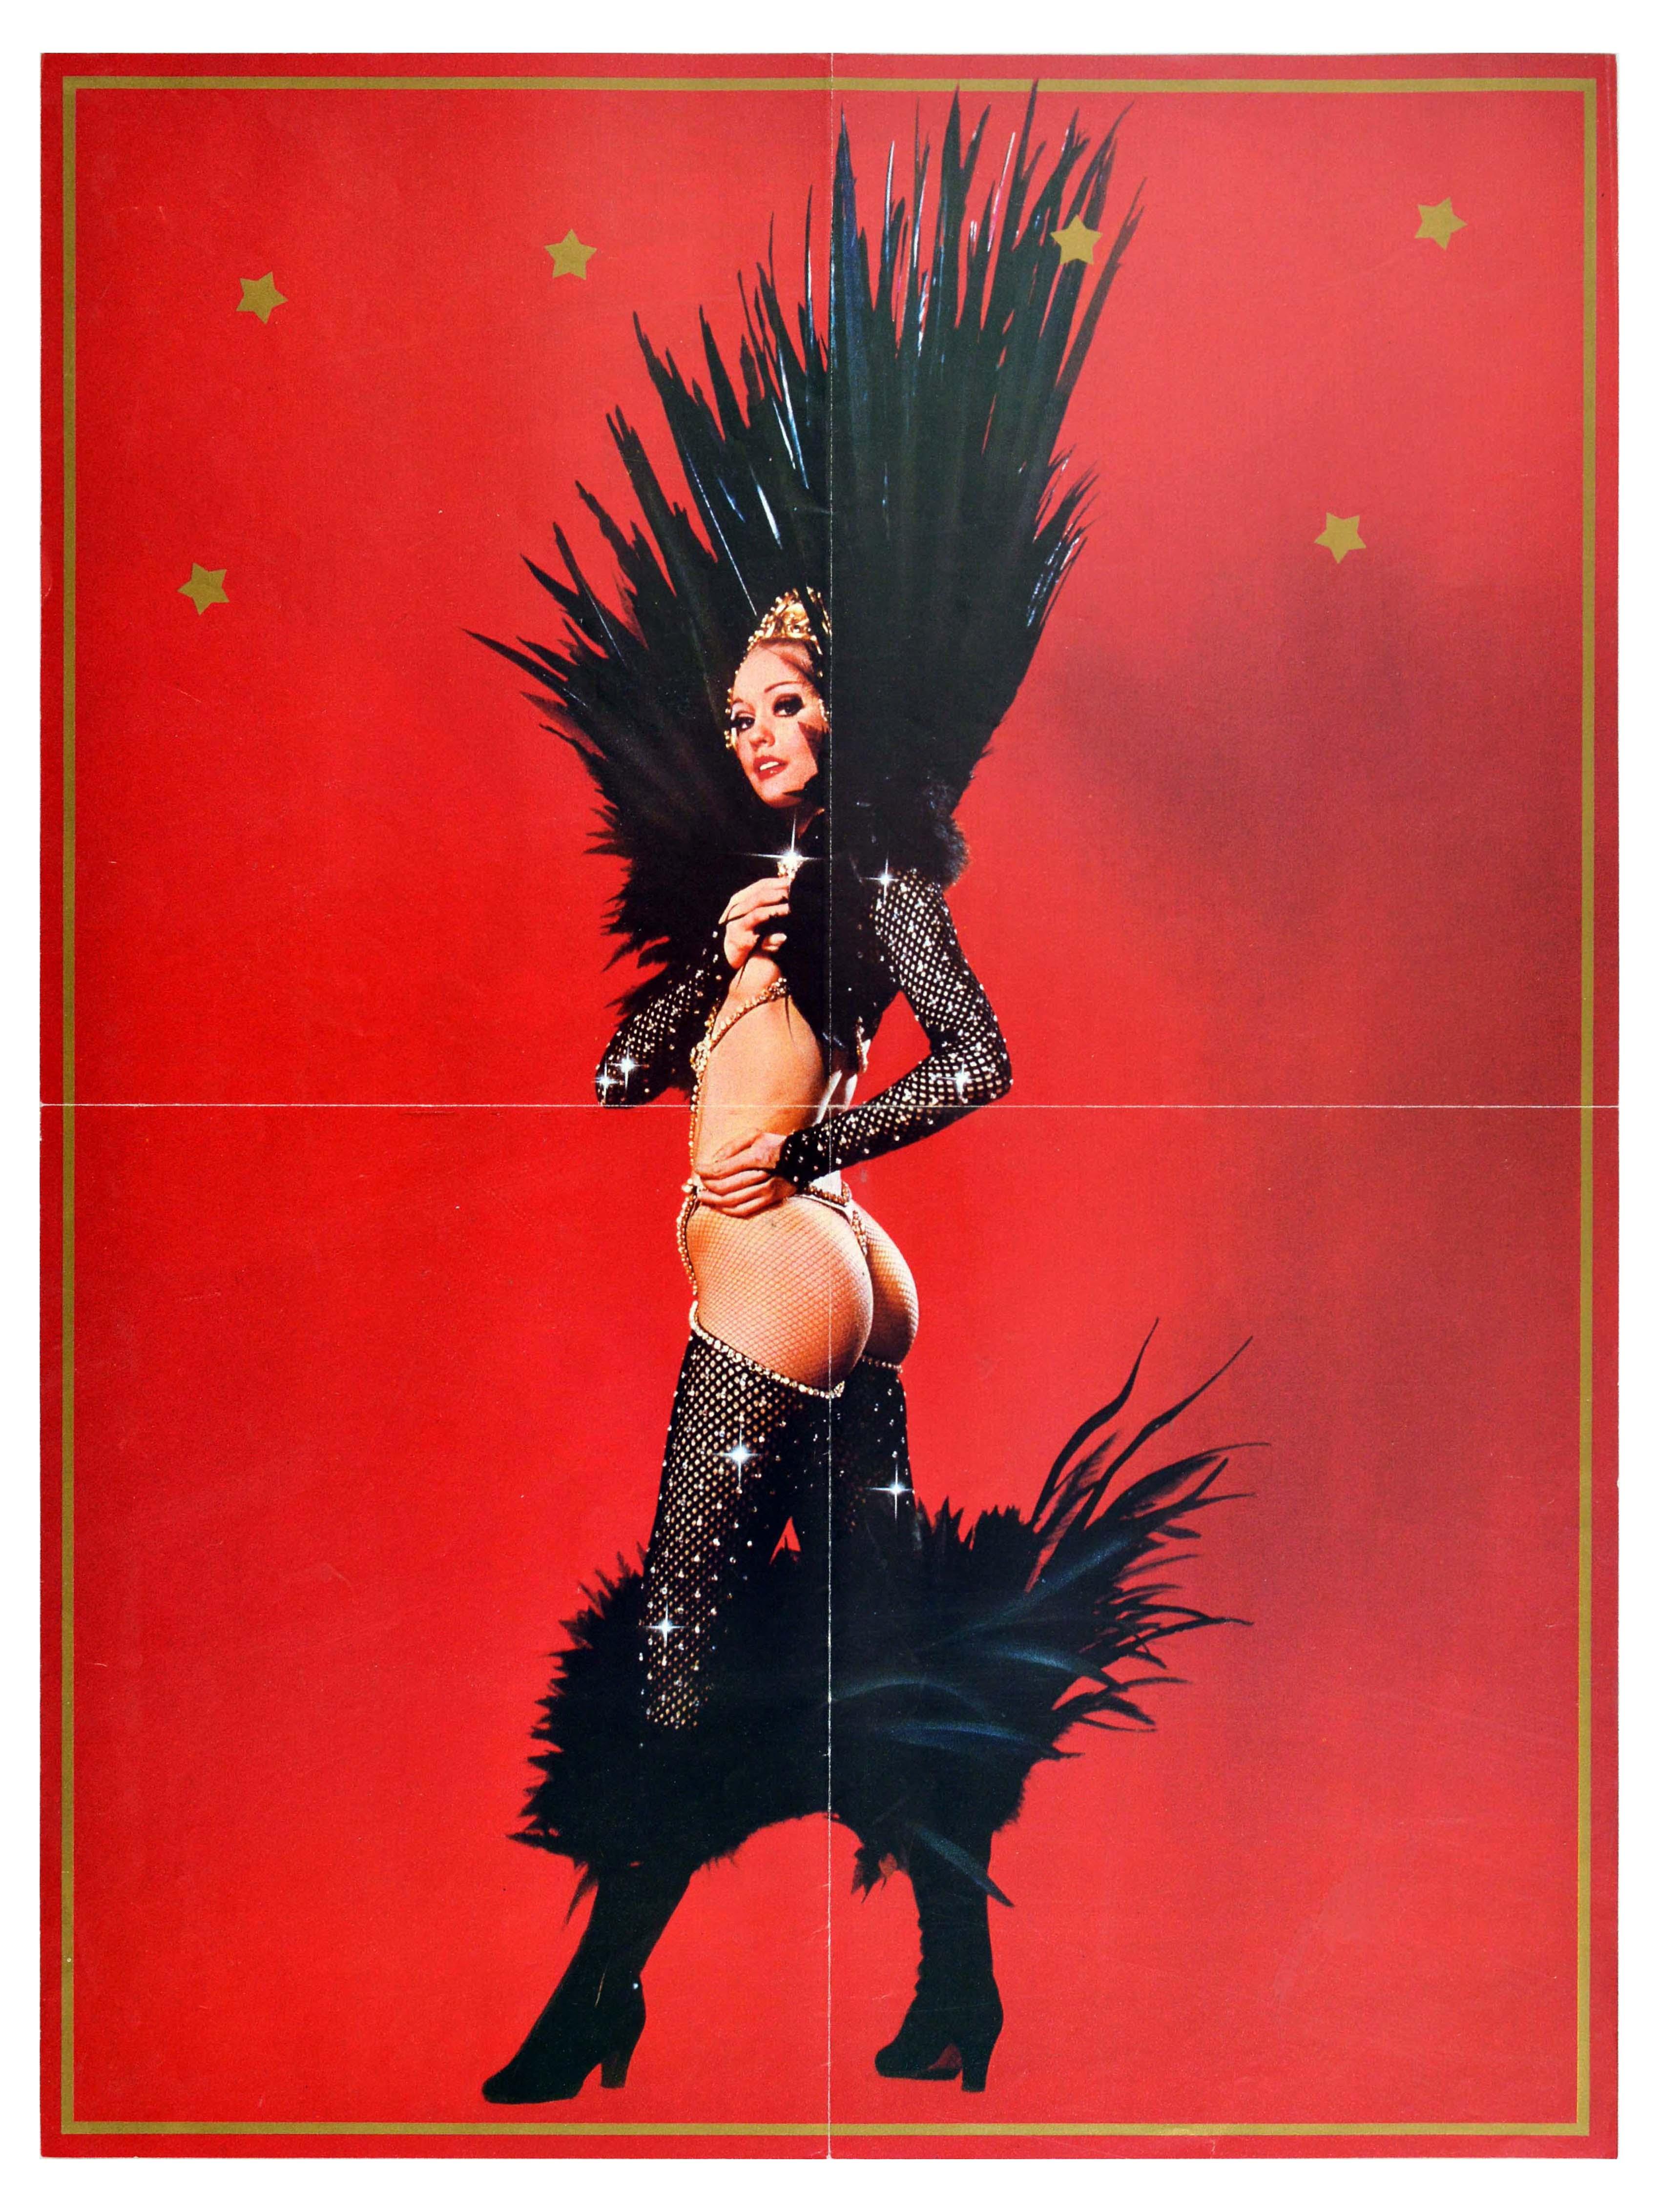 Advertising Poster Lido Cabaret Graue Champs Elysees Paris - Image 2 of 2